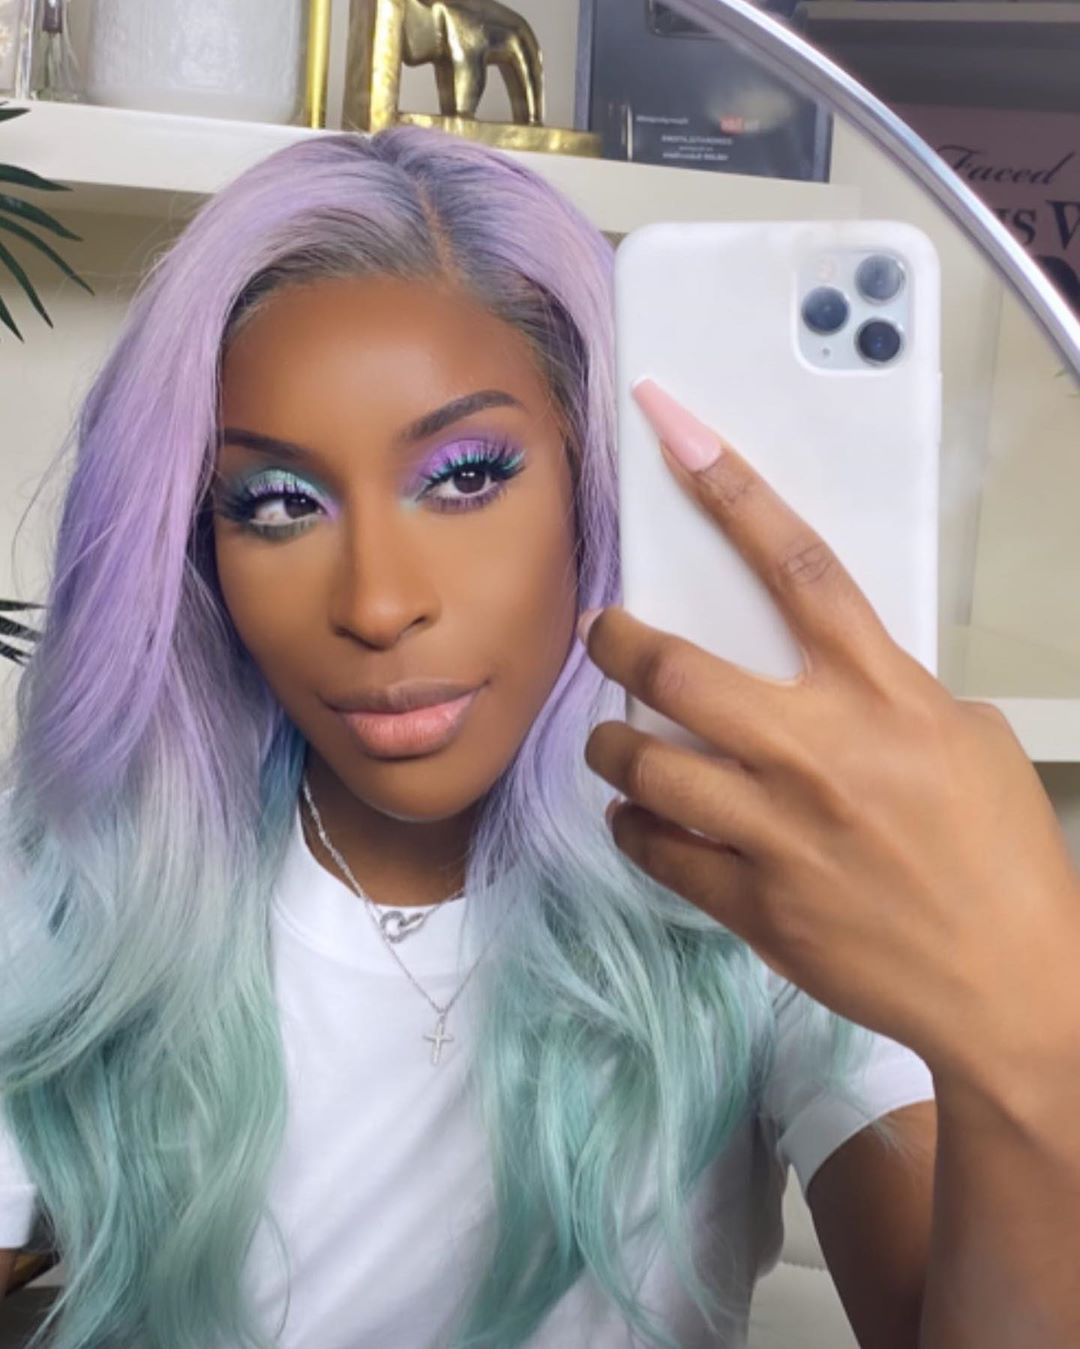 Jackie Aina's New Routine Proves Pastel Makeup Looks BOMB On Dark Skin | BN Style